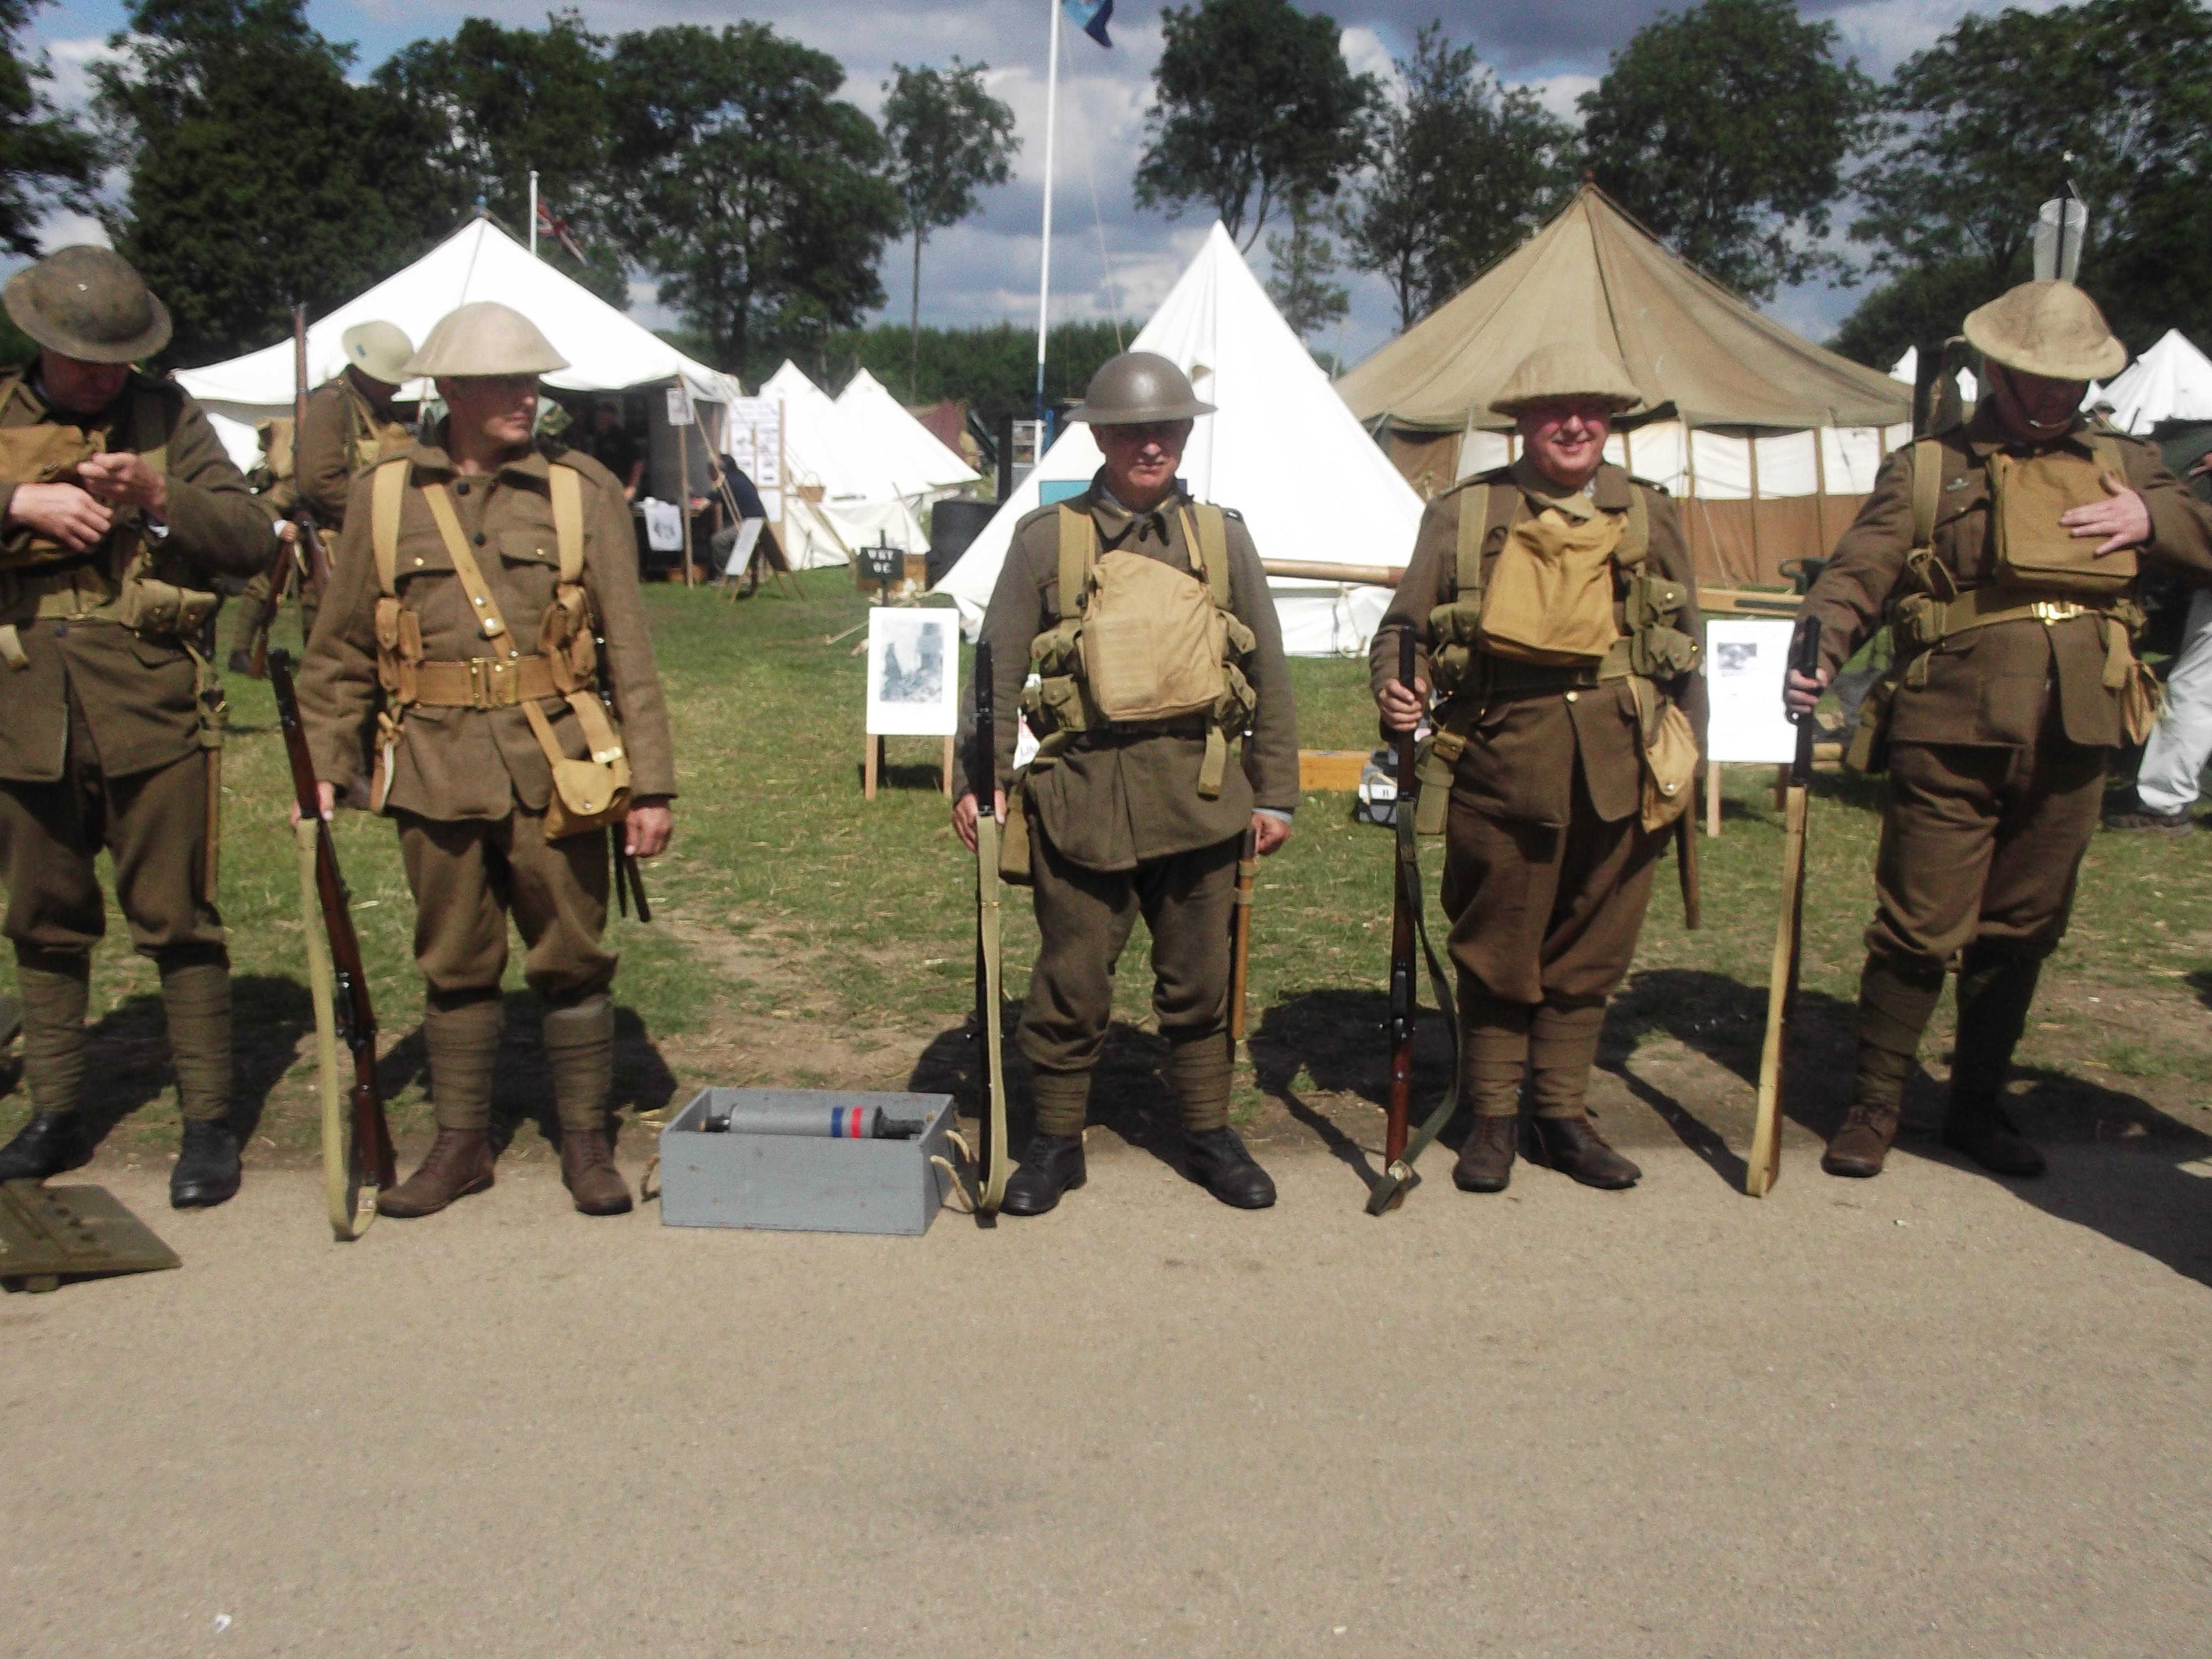 Royal west Kent regiment reenactment group by FFDP-Neko